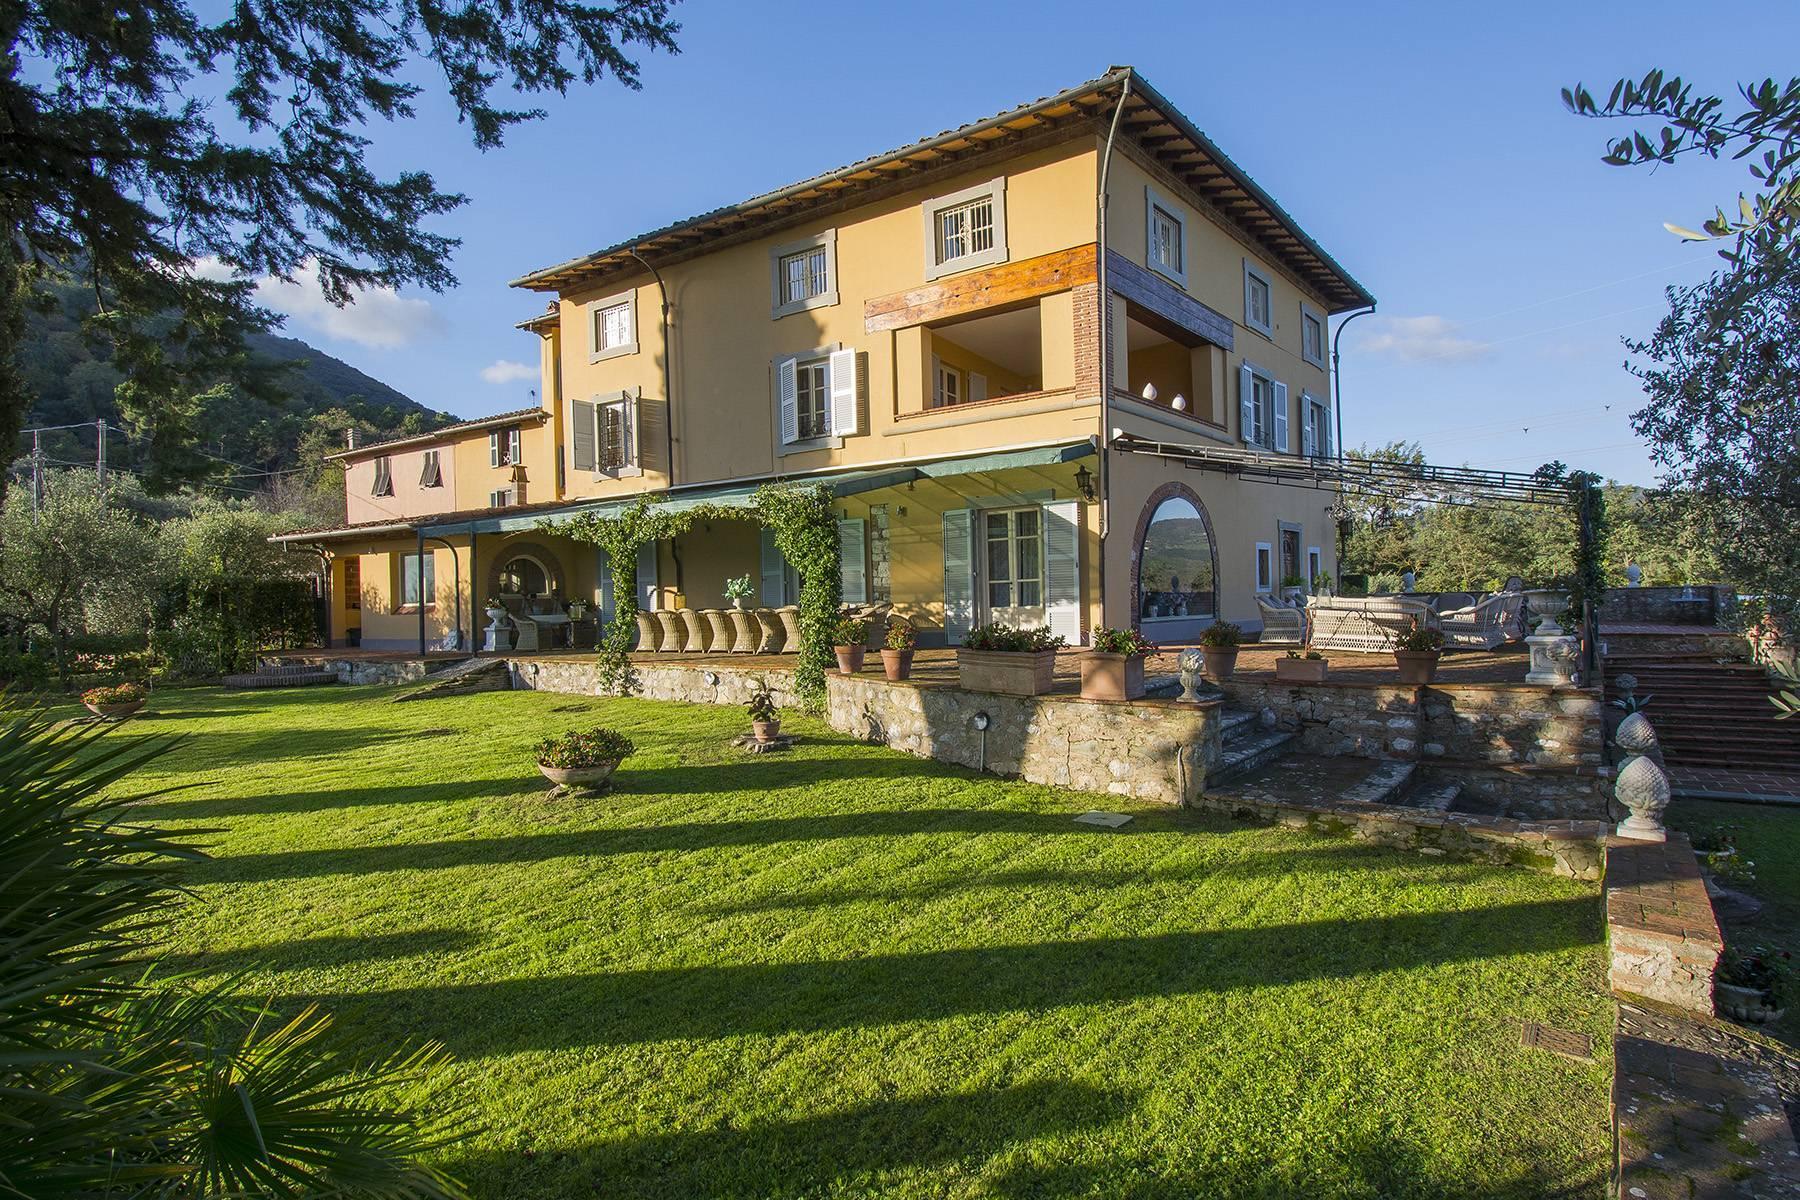 Romantic luxury Villa on the hills of Lucca - 4